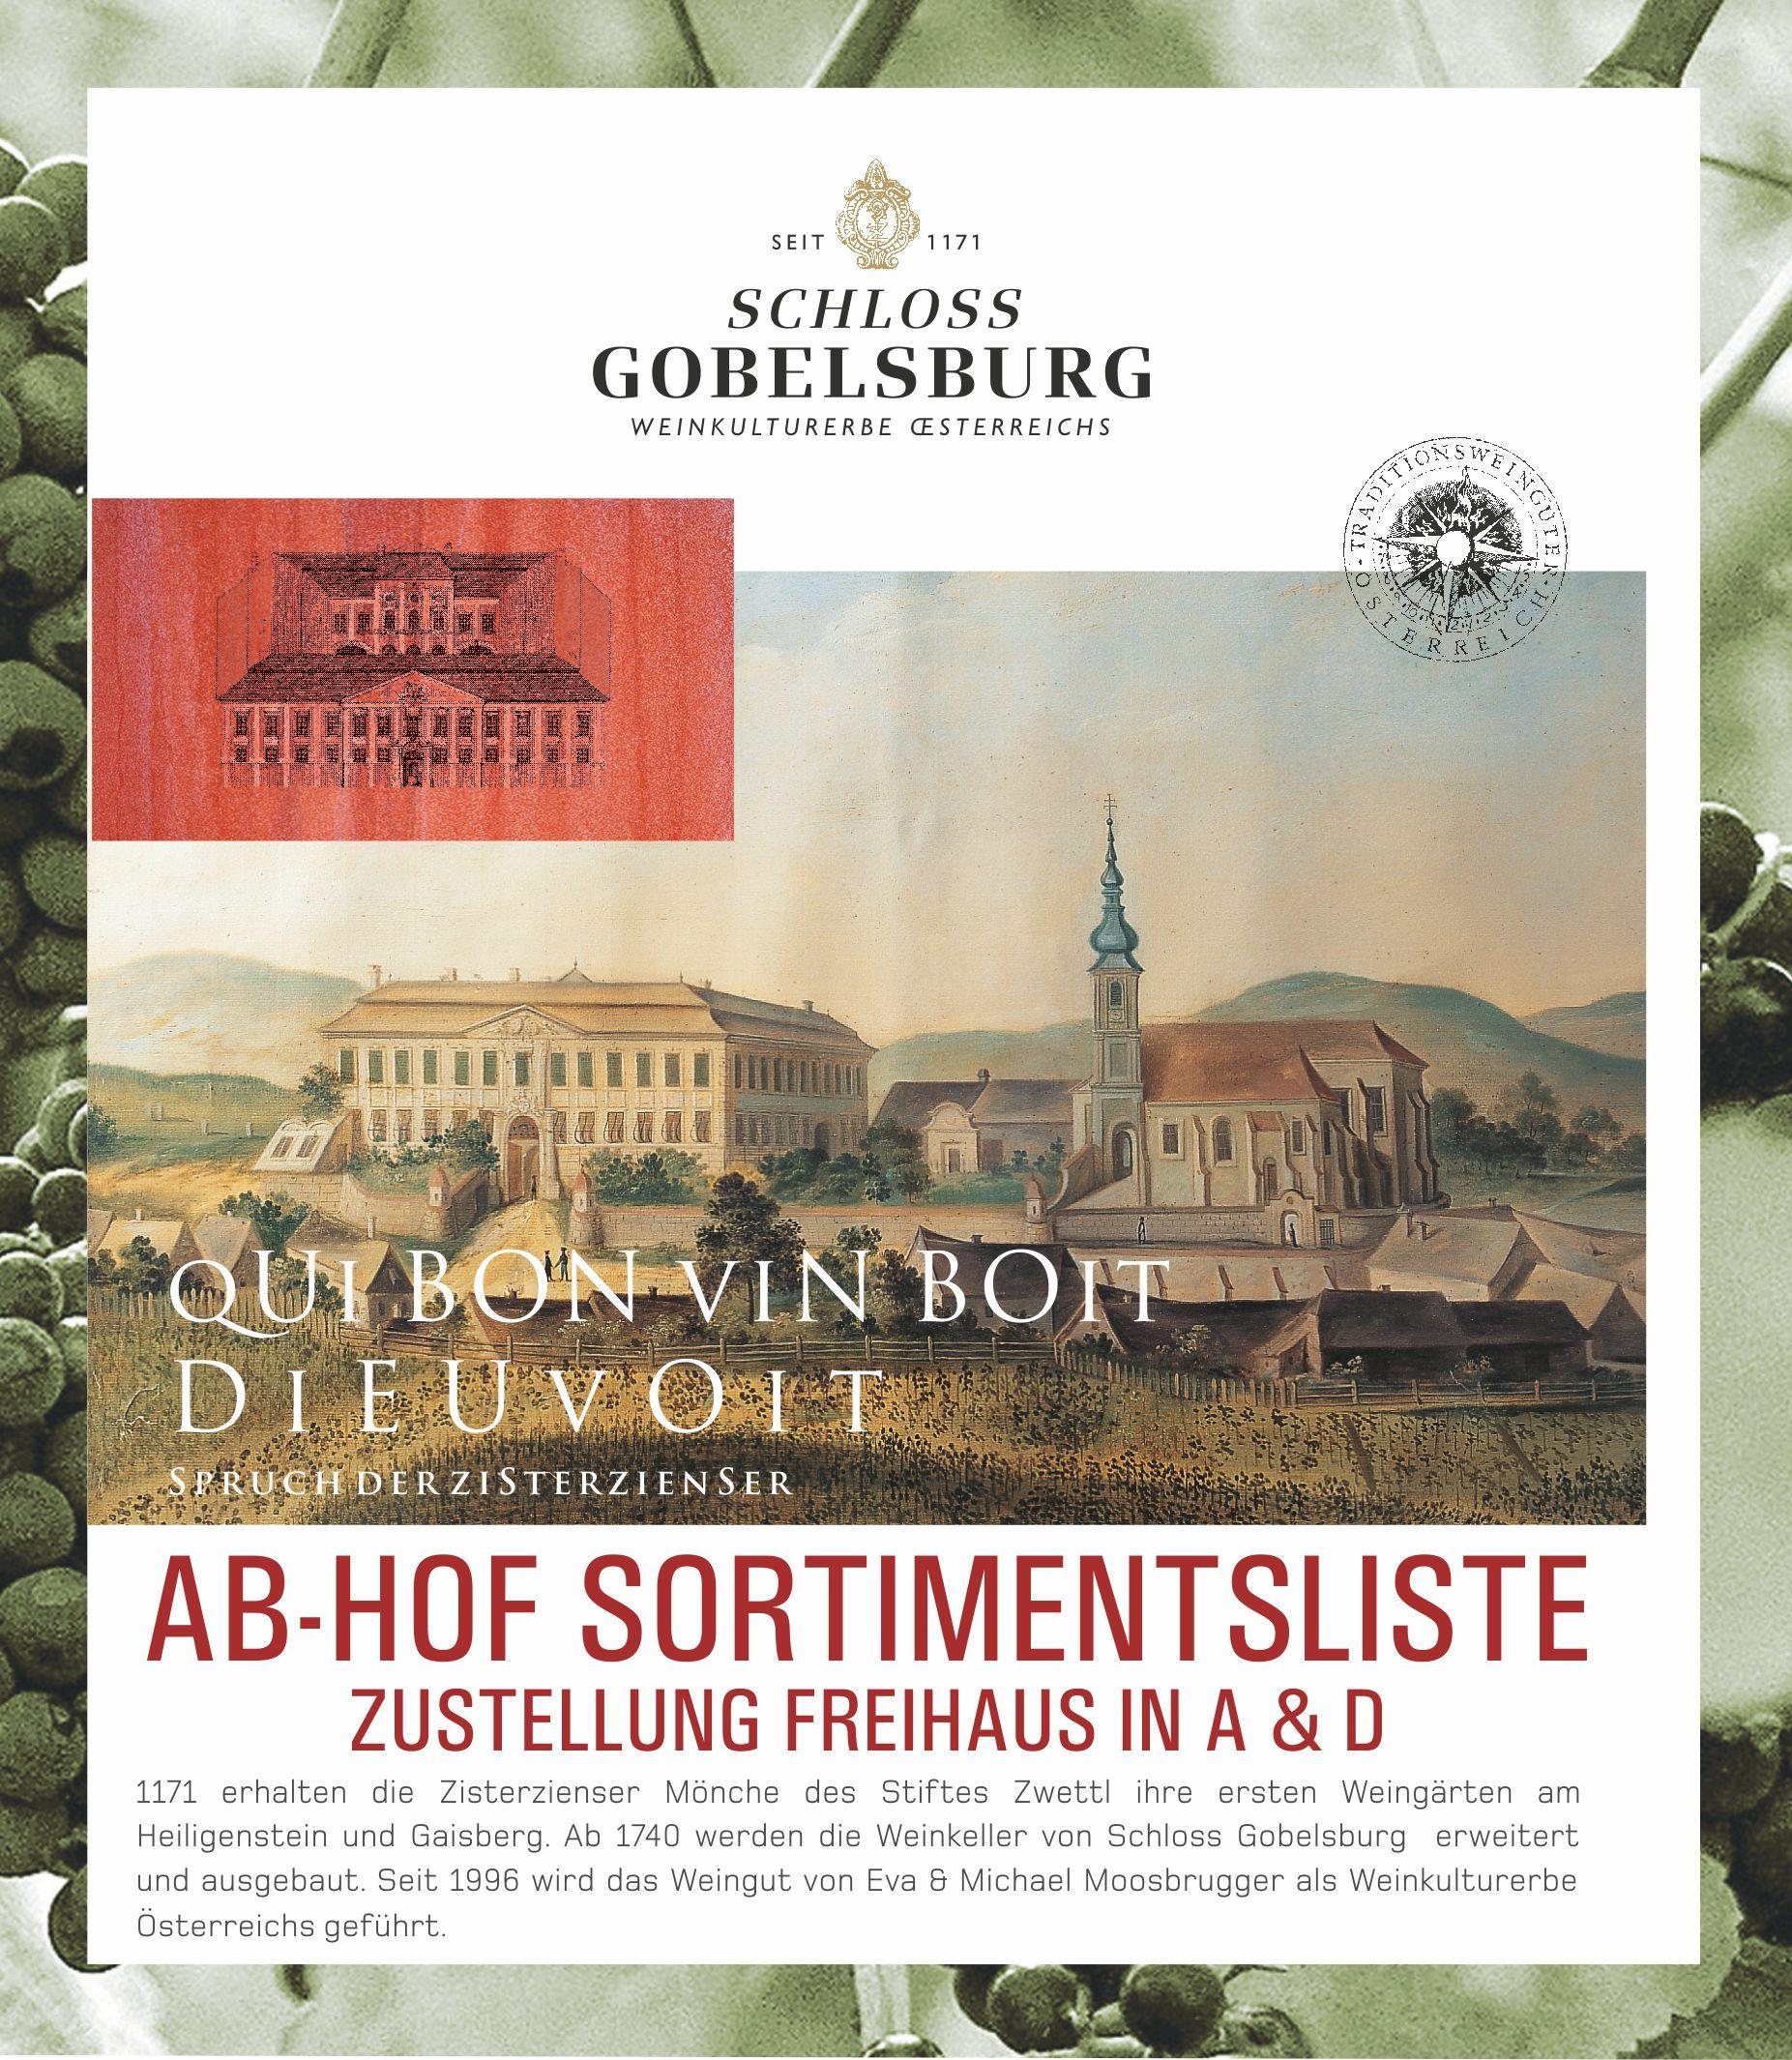 Schloss Gobelsburg on Facebook